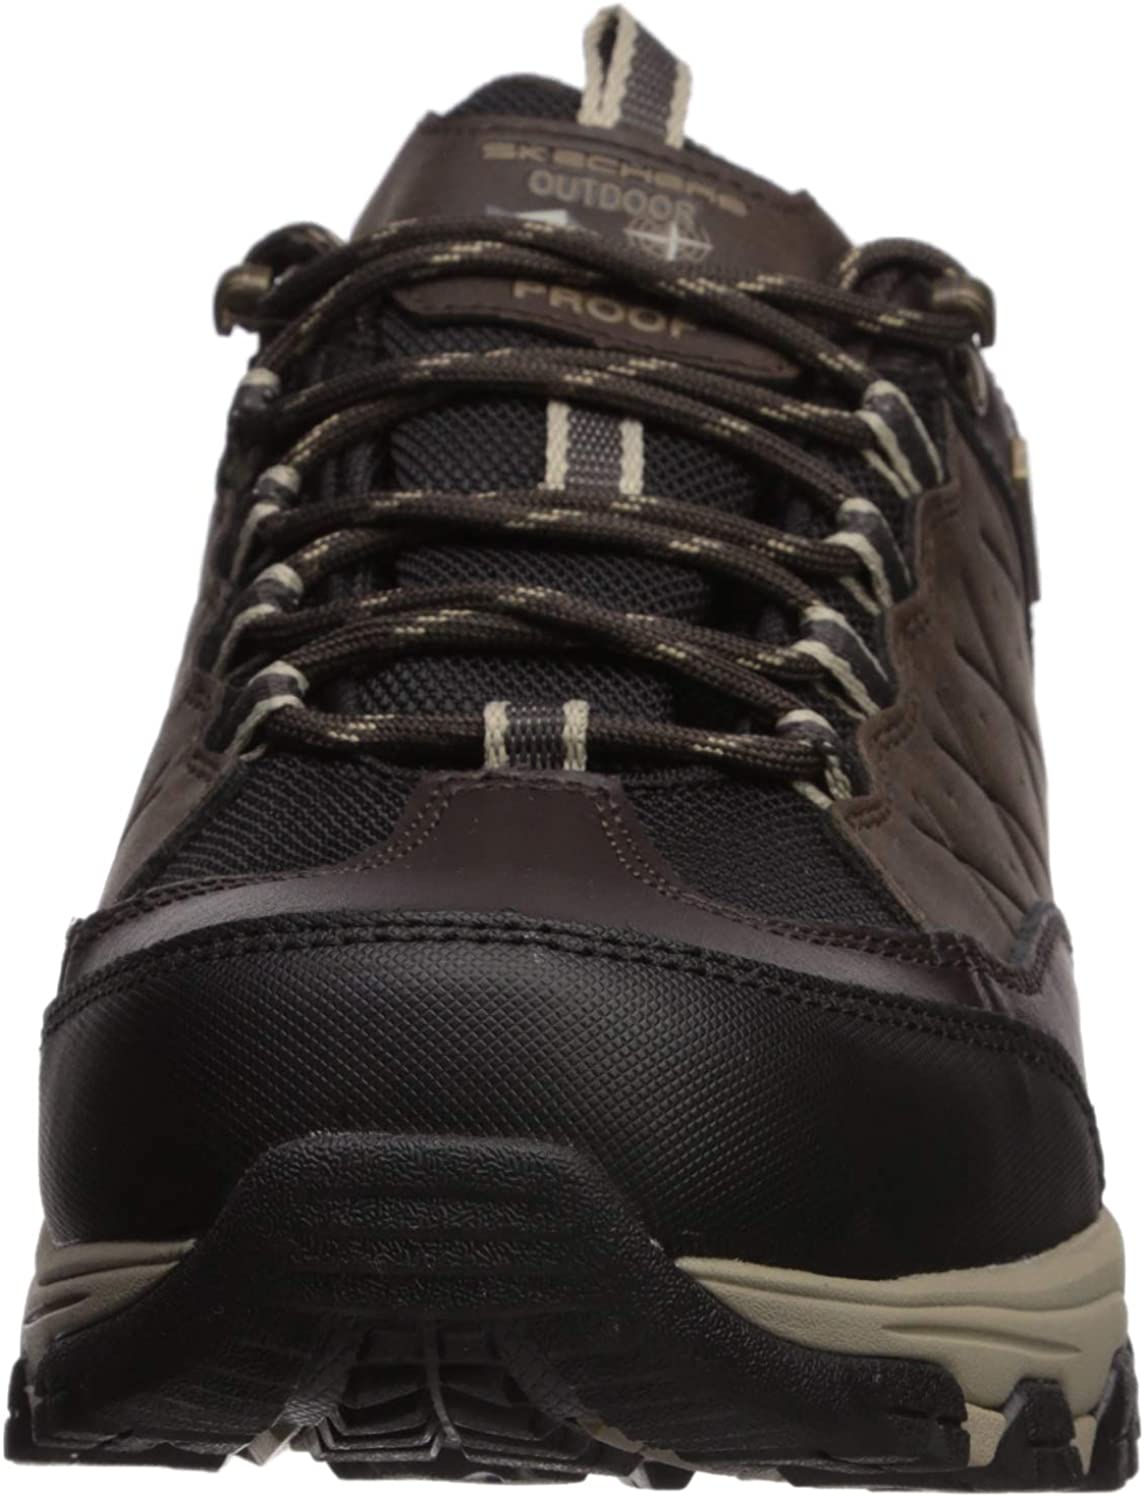 Skechers Mens Outline-SOLEGO Trail Oxford Hiking Shoe